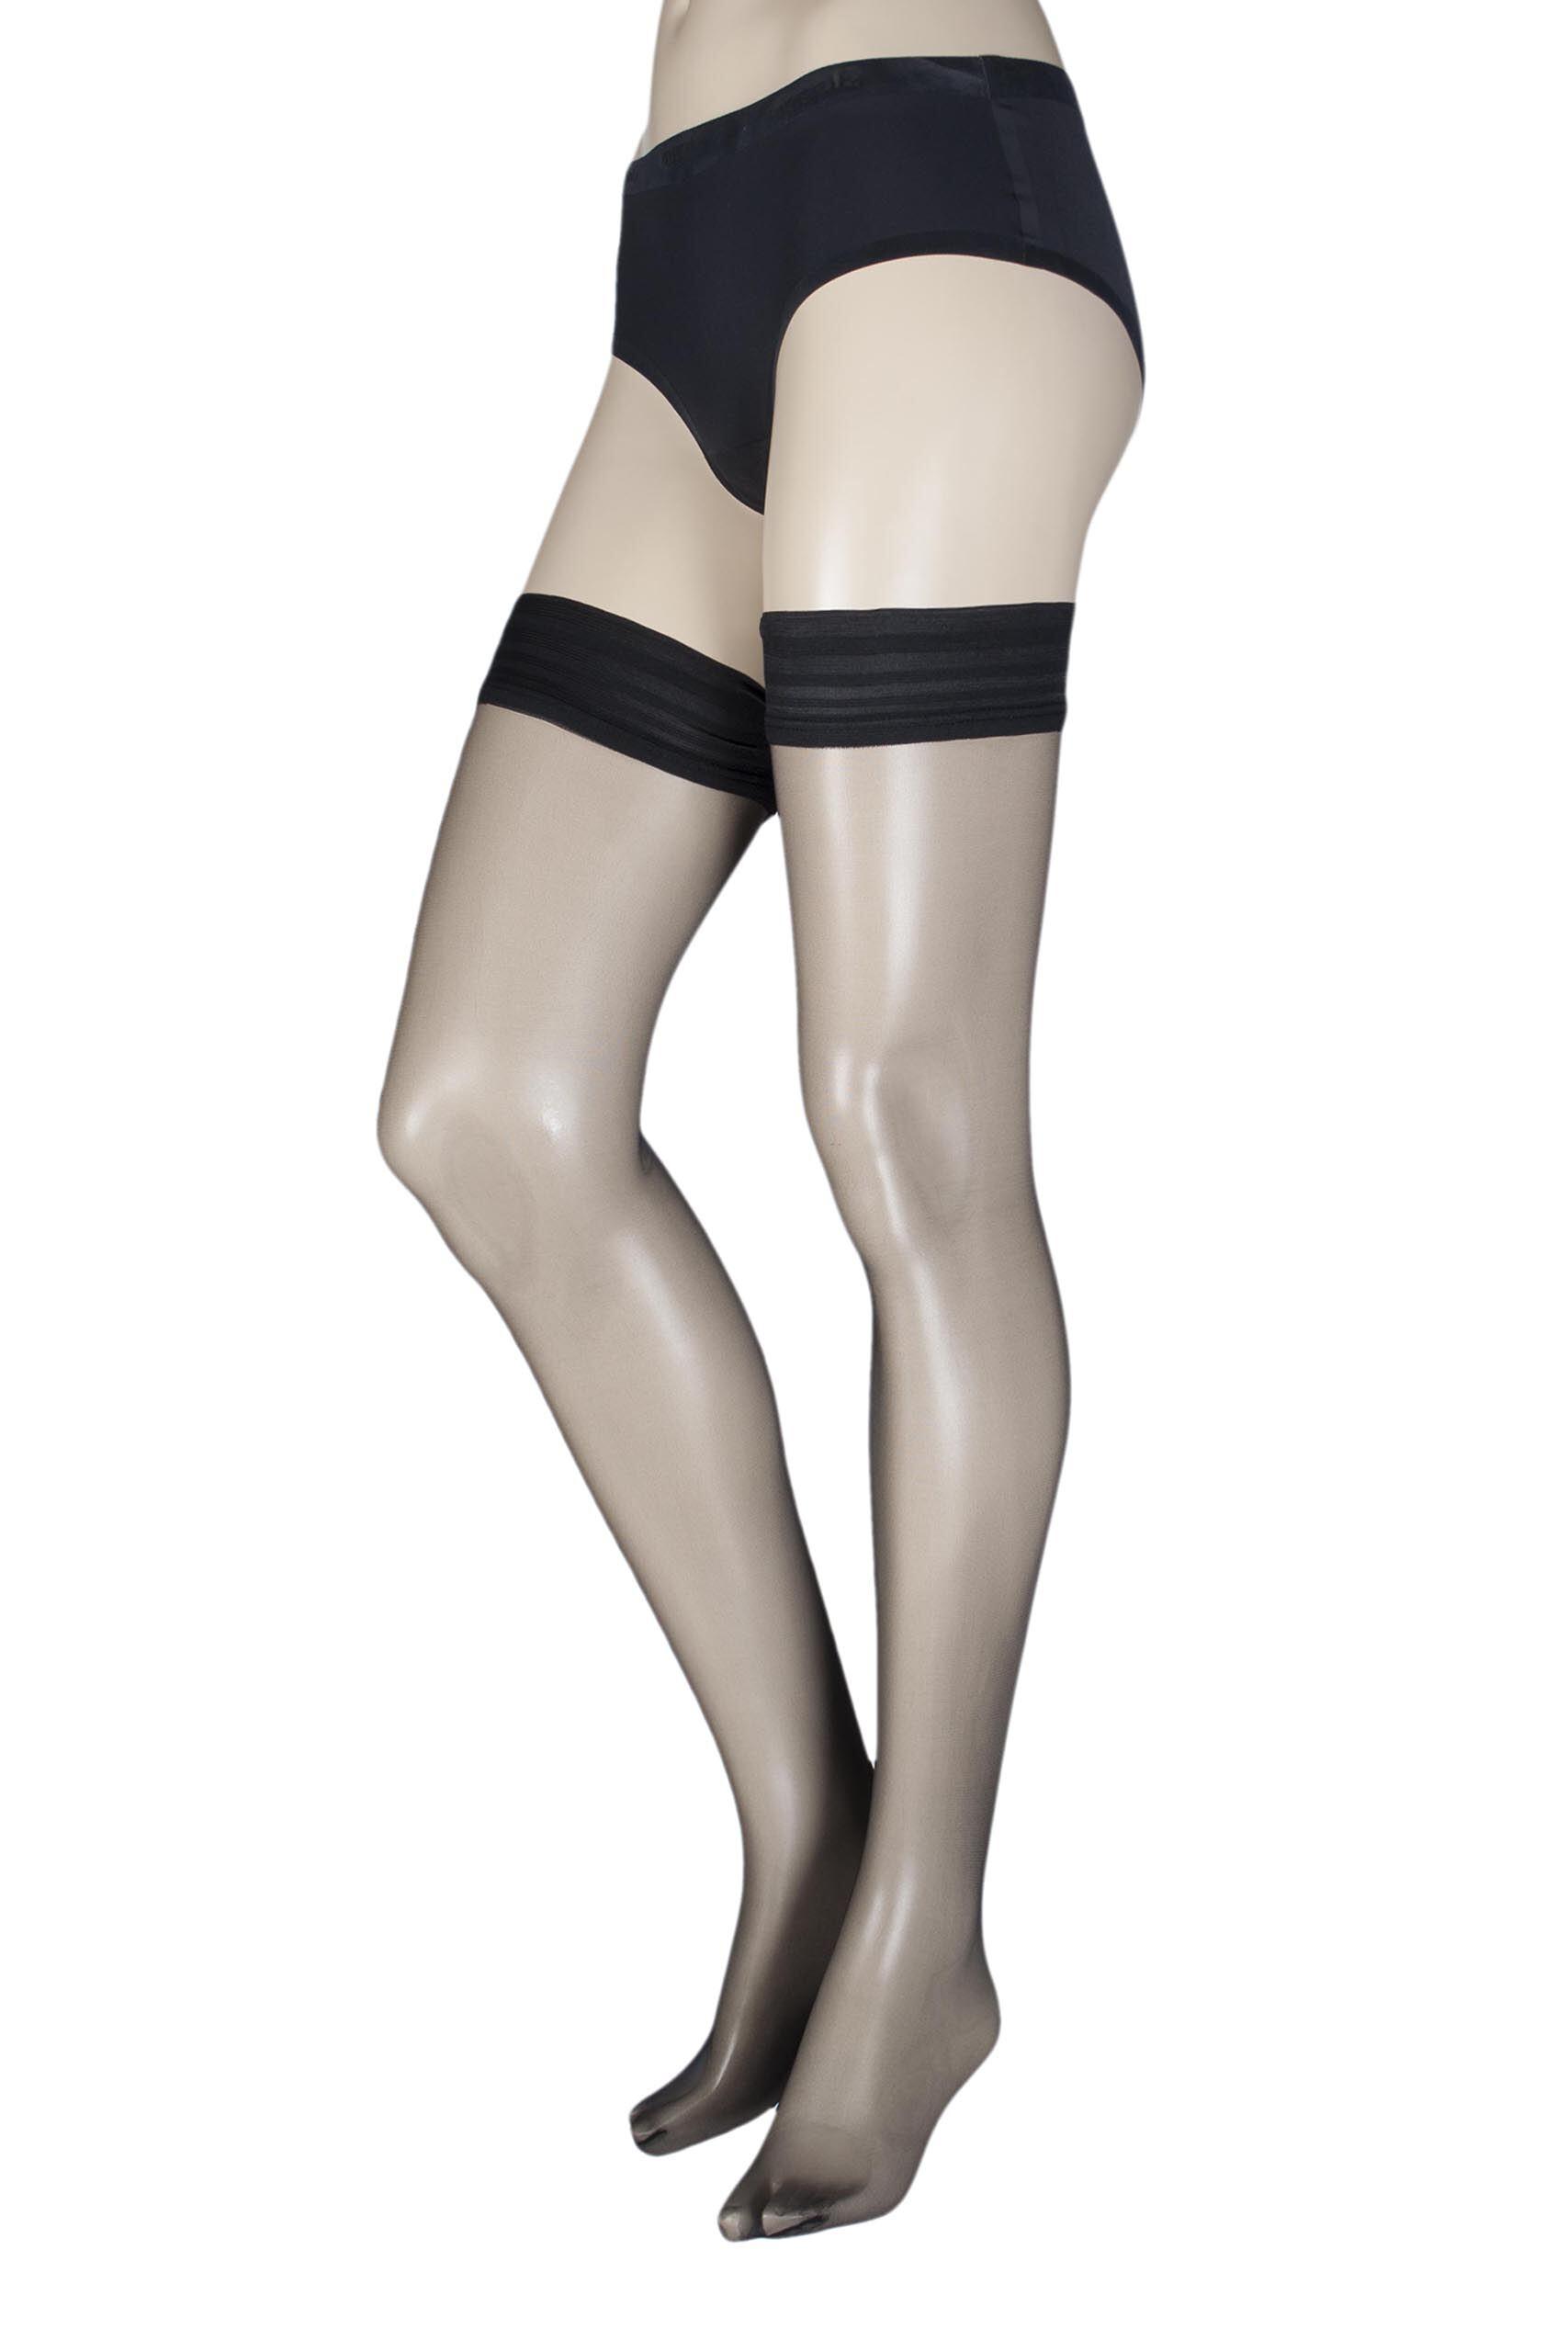 Image of 1 Pair Black Ultimate Sexy Sheer Hold Ups Ladies Medium - Calvin Klein